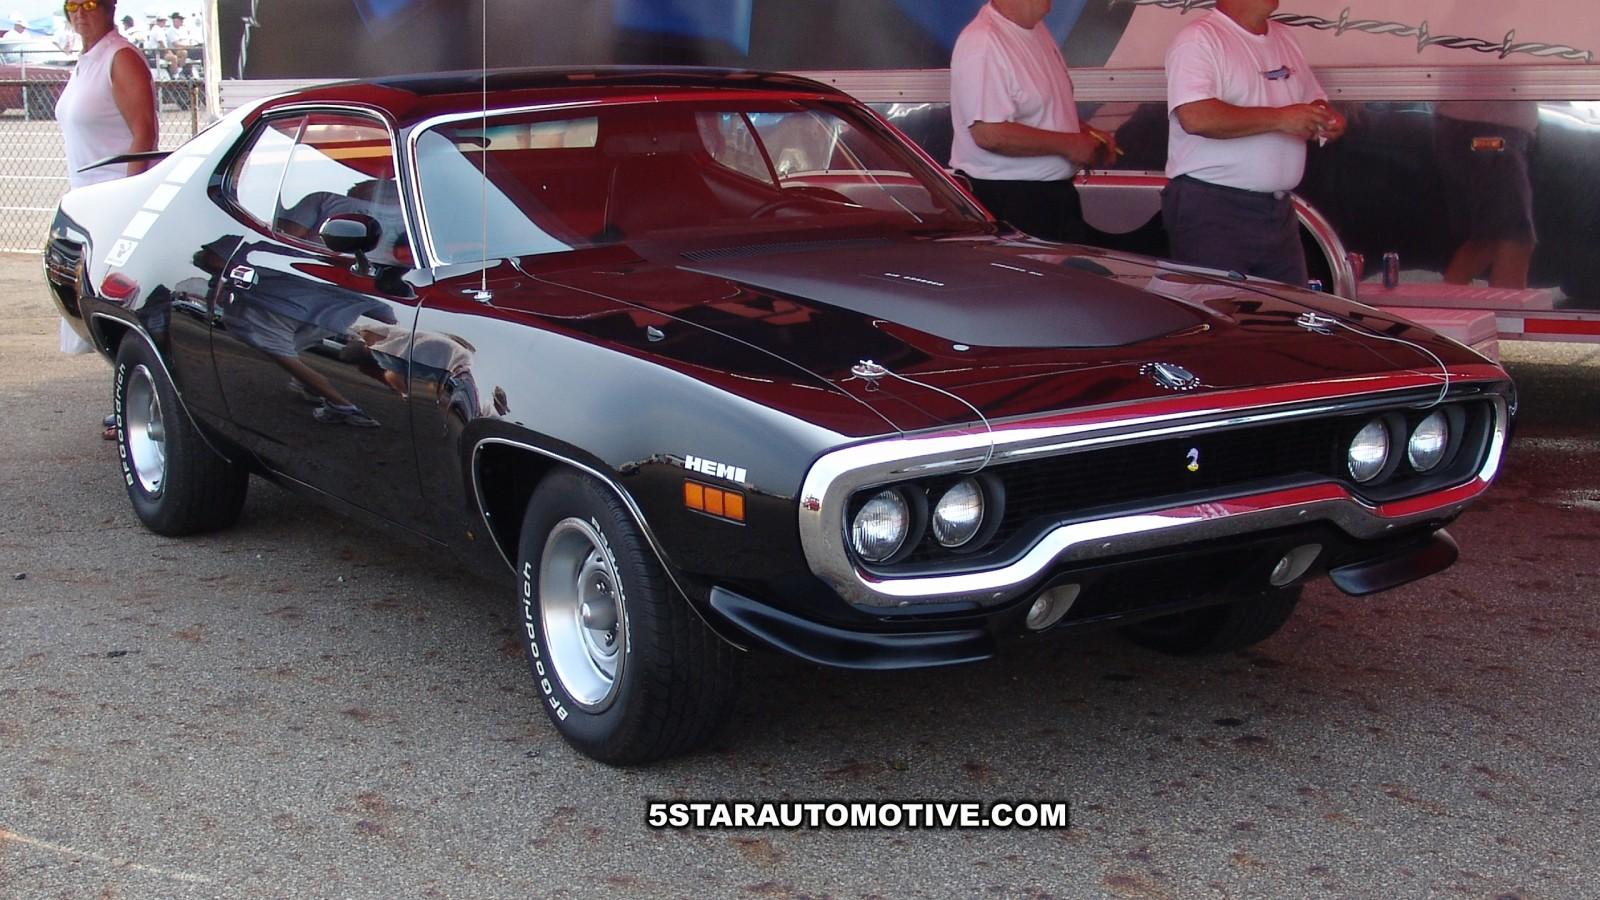 1971 Plymouth Road Runner Hemi 1600x900 - Wallpaper - 5 Star Automotive